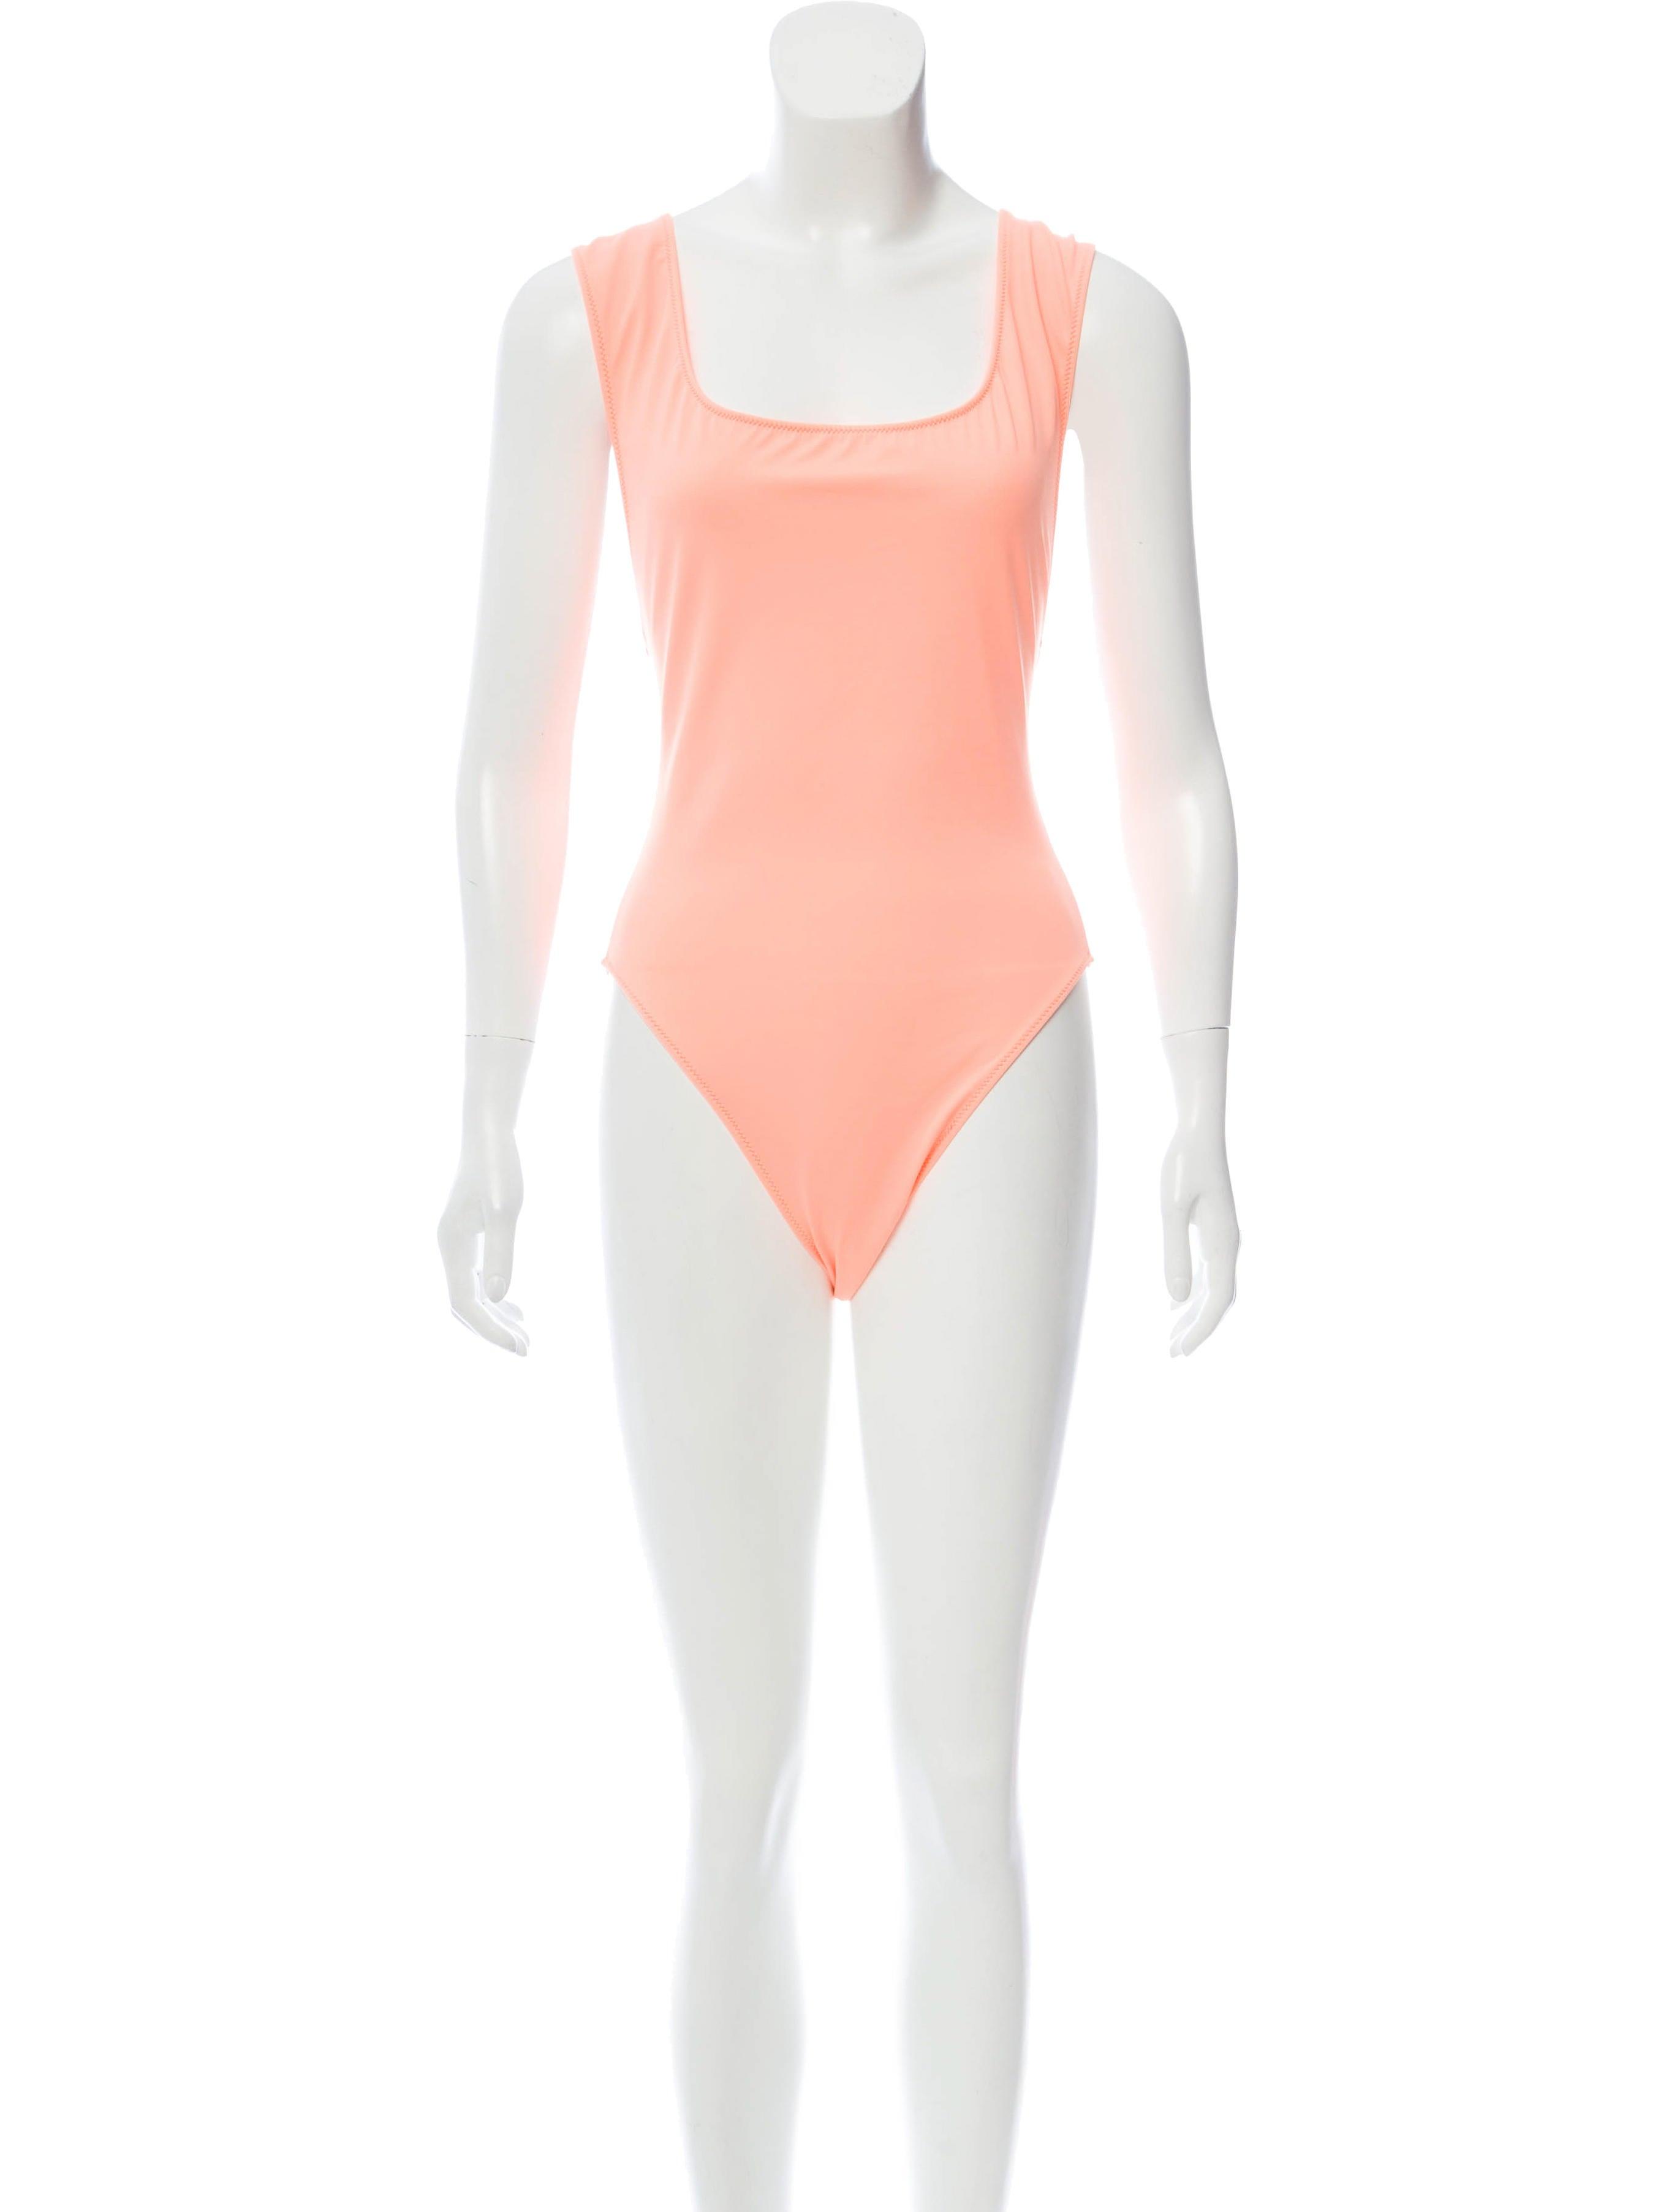 38fefb034f9901 Araks Jireh Cutout Swimsuit w/ Tags - Clothing - ARA20059 | The RealReal